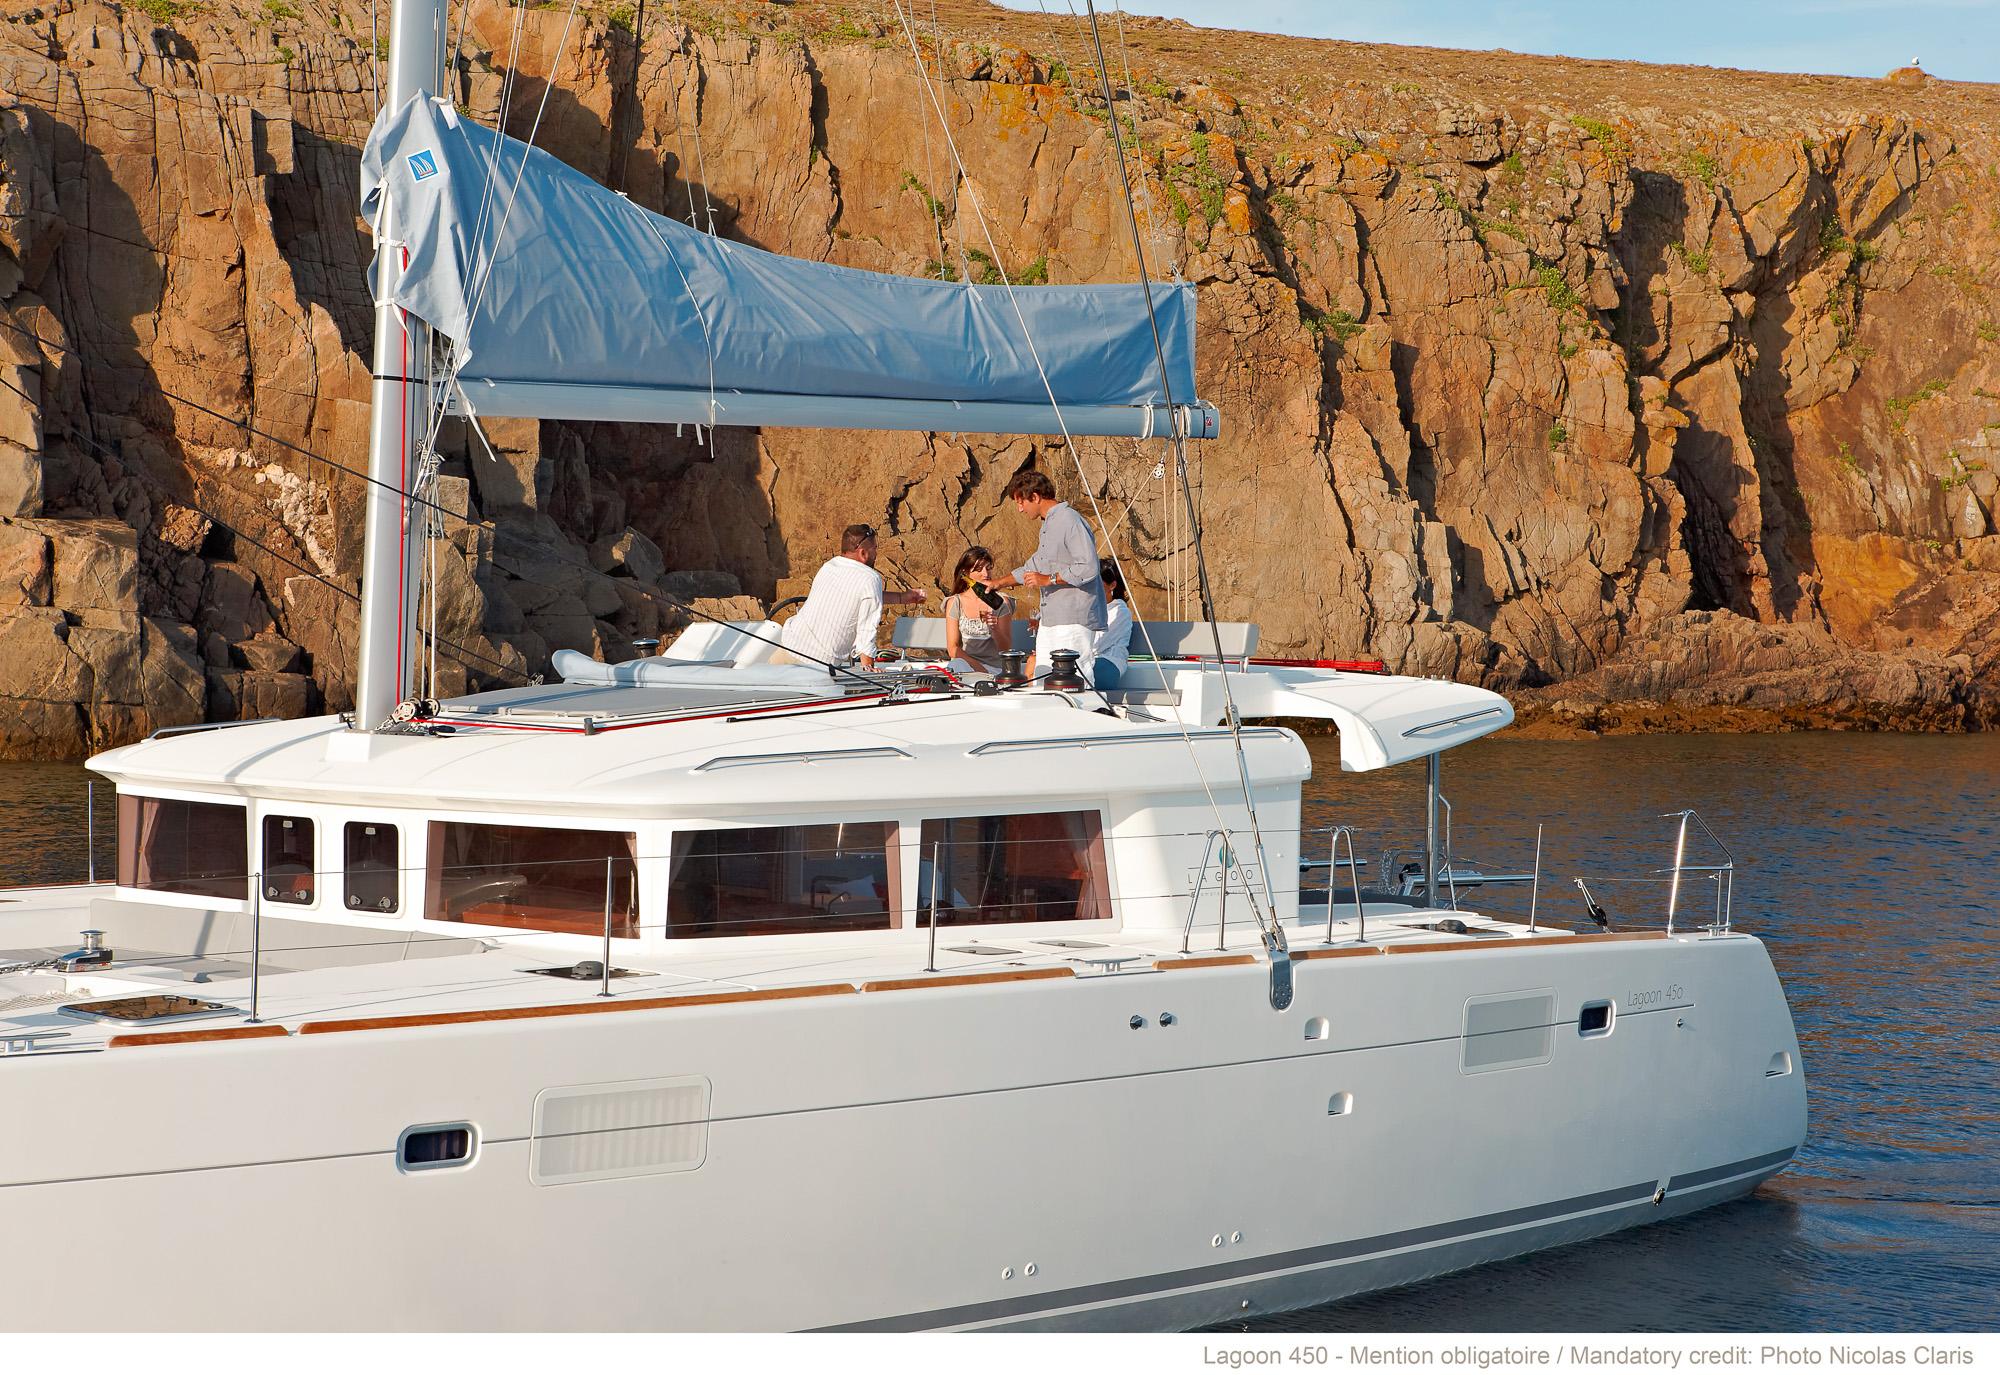 帆船 lagoon 450F 蓝高450F双体帆船 蓝高450F双体帆船